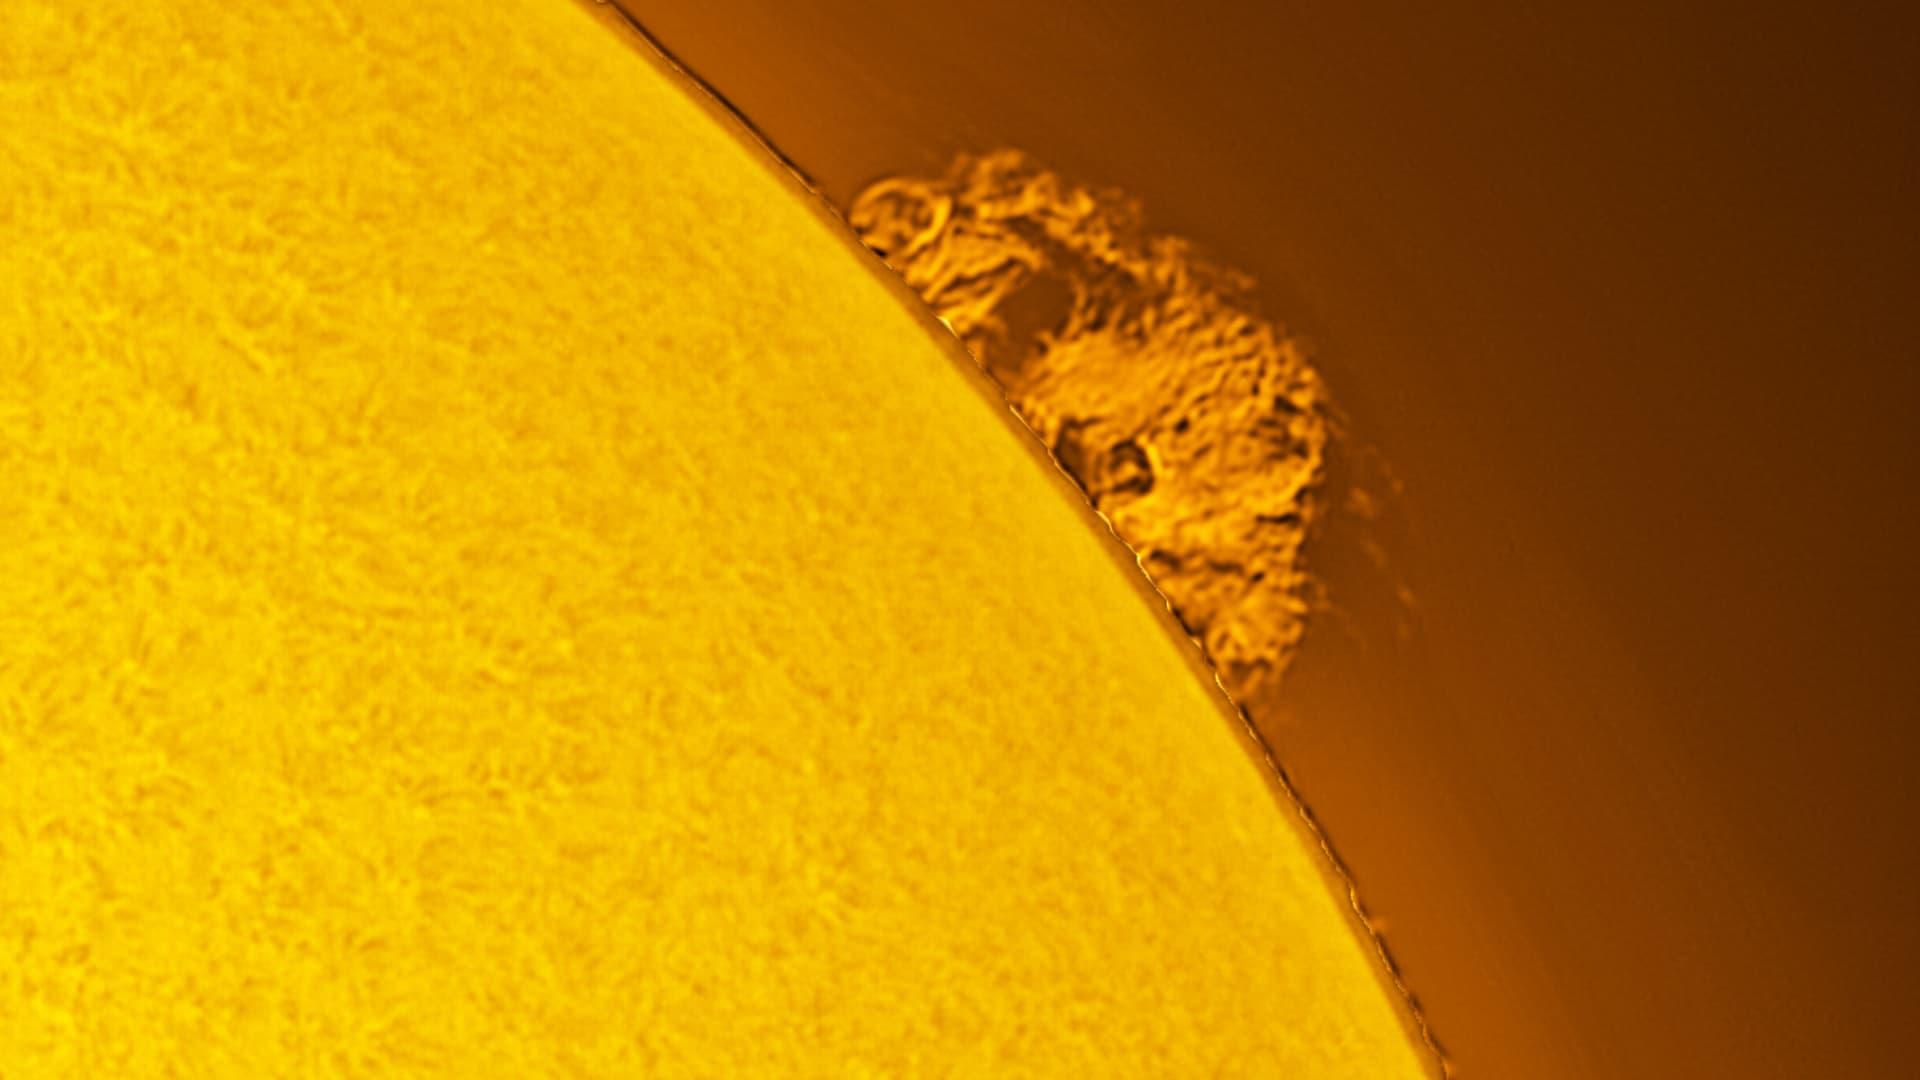 Sonnenprotuberanz am 23. Februar 2021